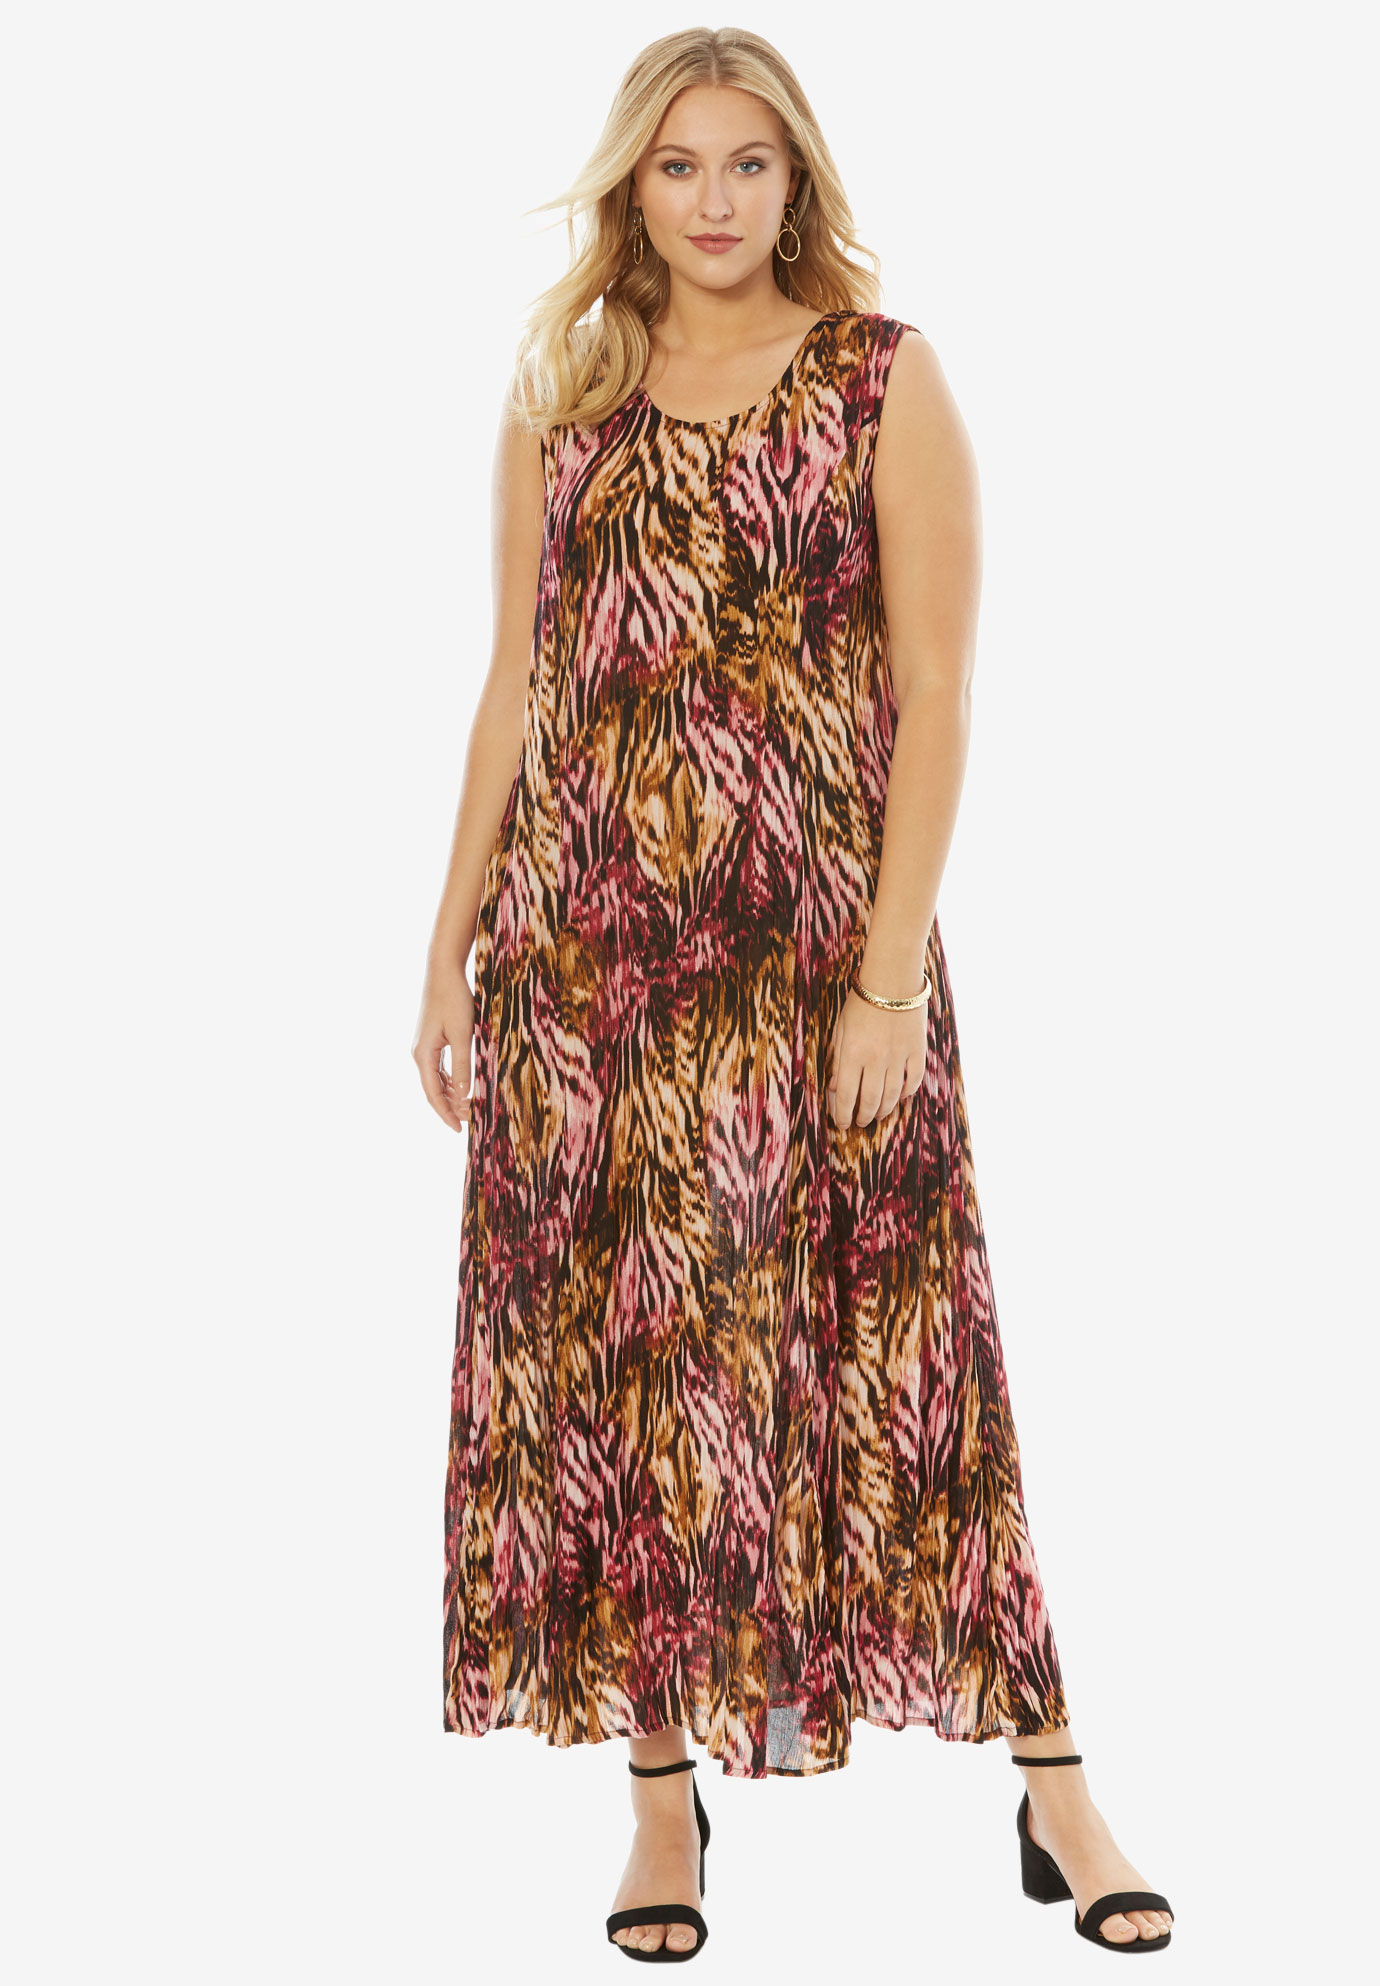 Leopard print strapless maxi dress plus size